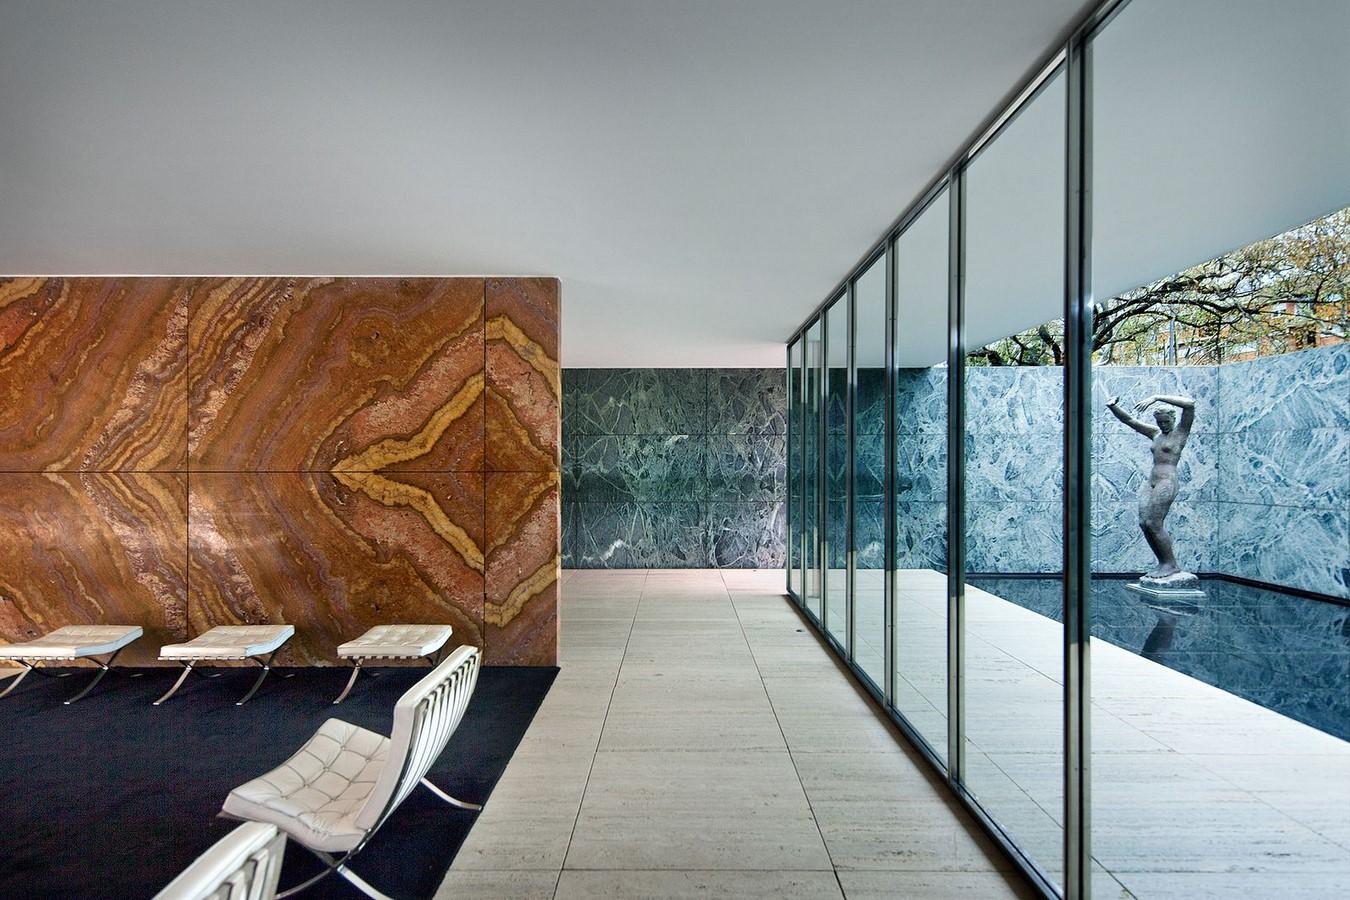 Barcelona Pavilion, Barcelona Spain by Ludwig Mies Van der Rohe -Sheet2